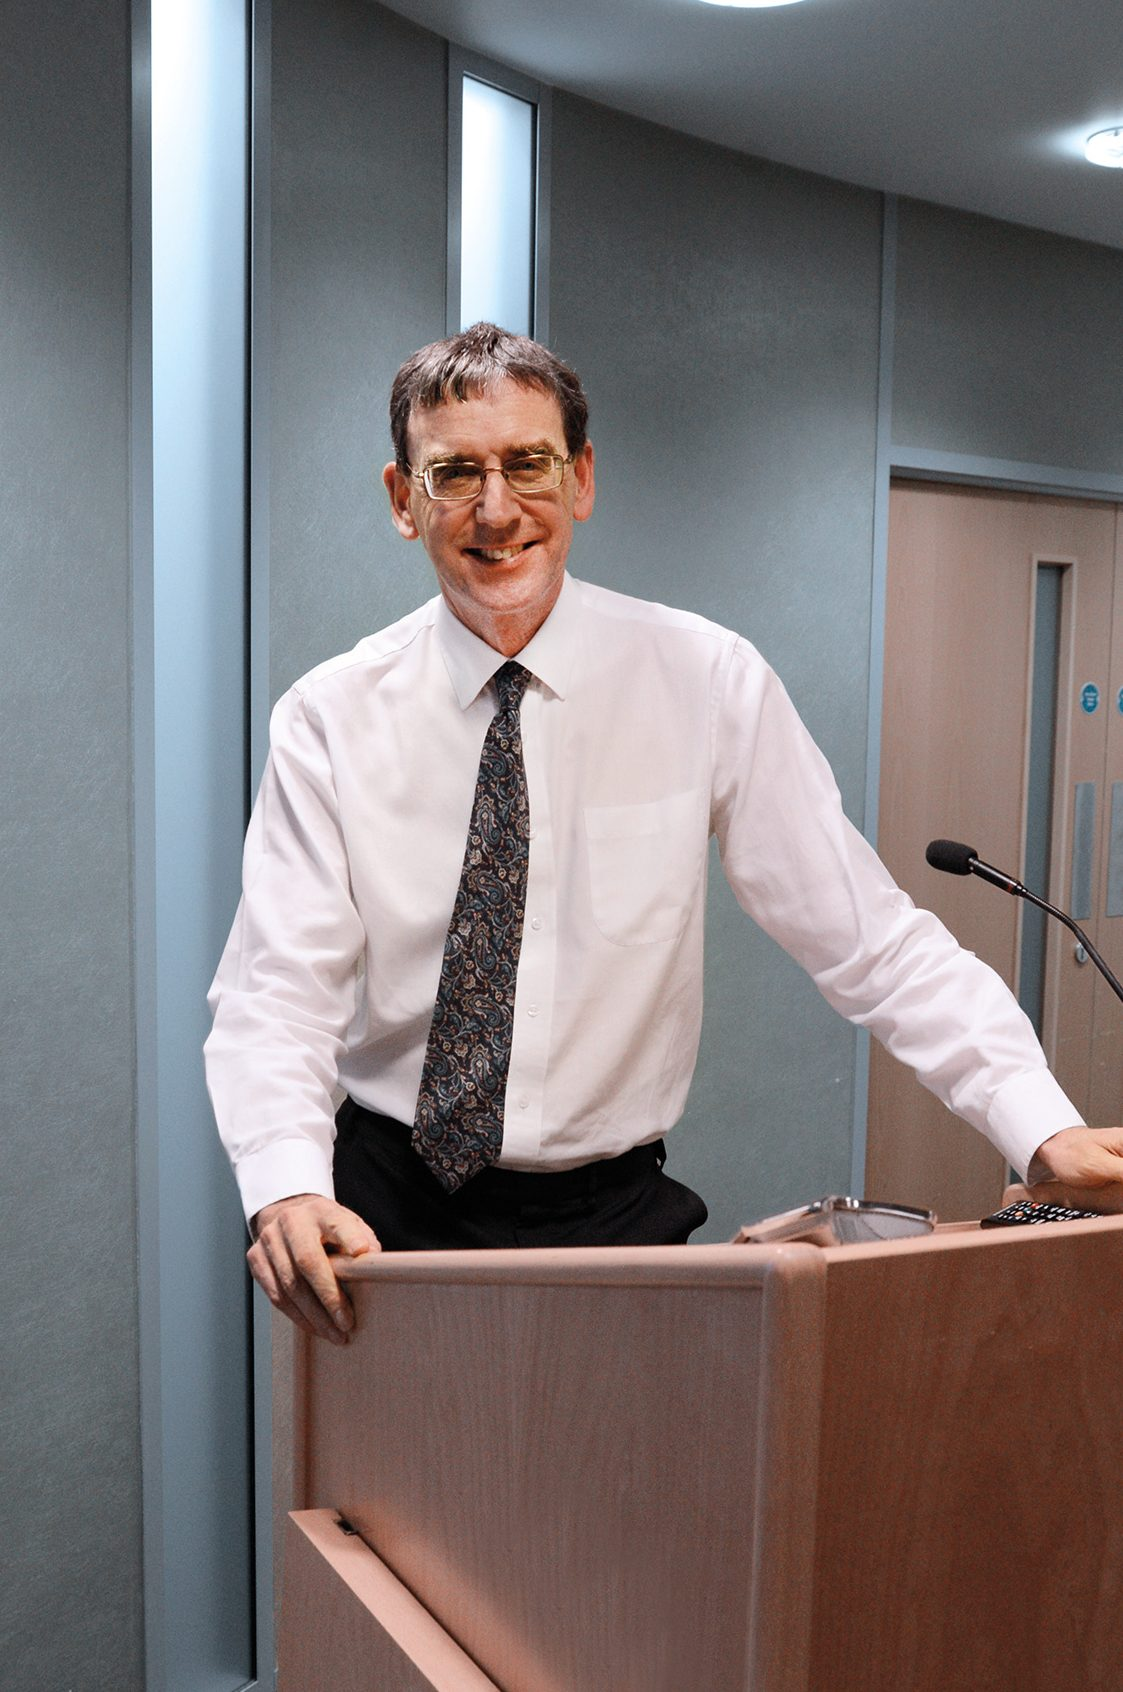 A photo of John Pullinger, UK National Statistician.